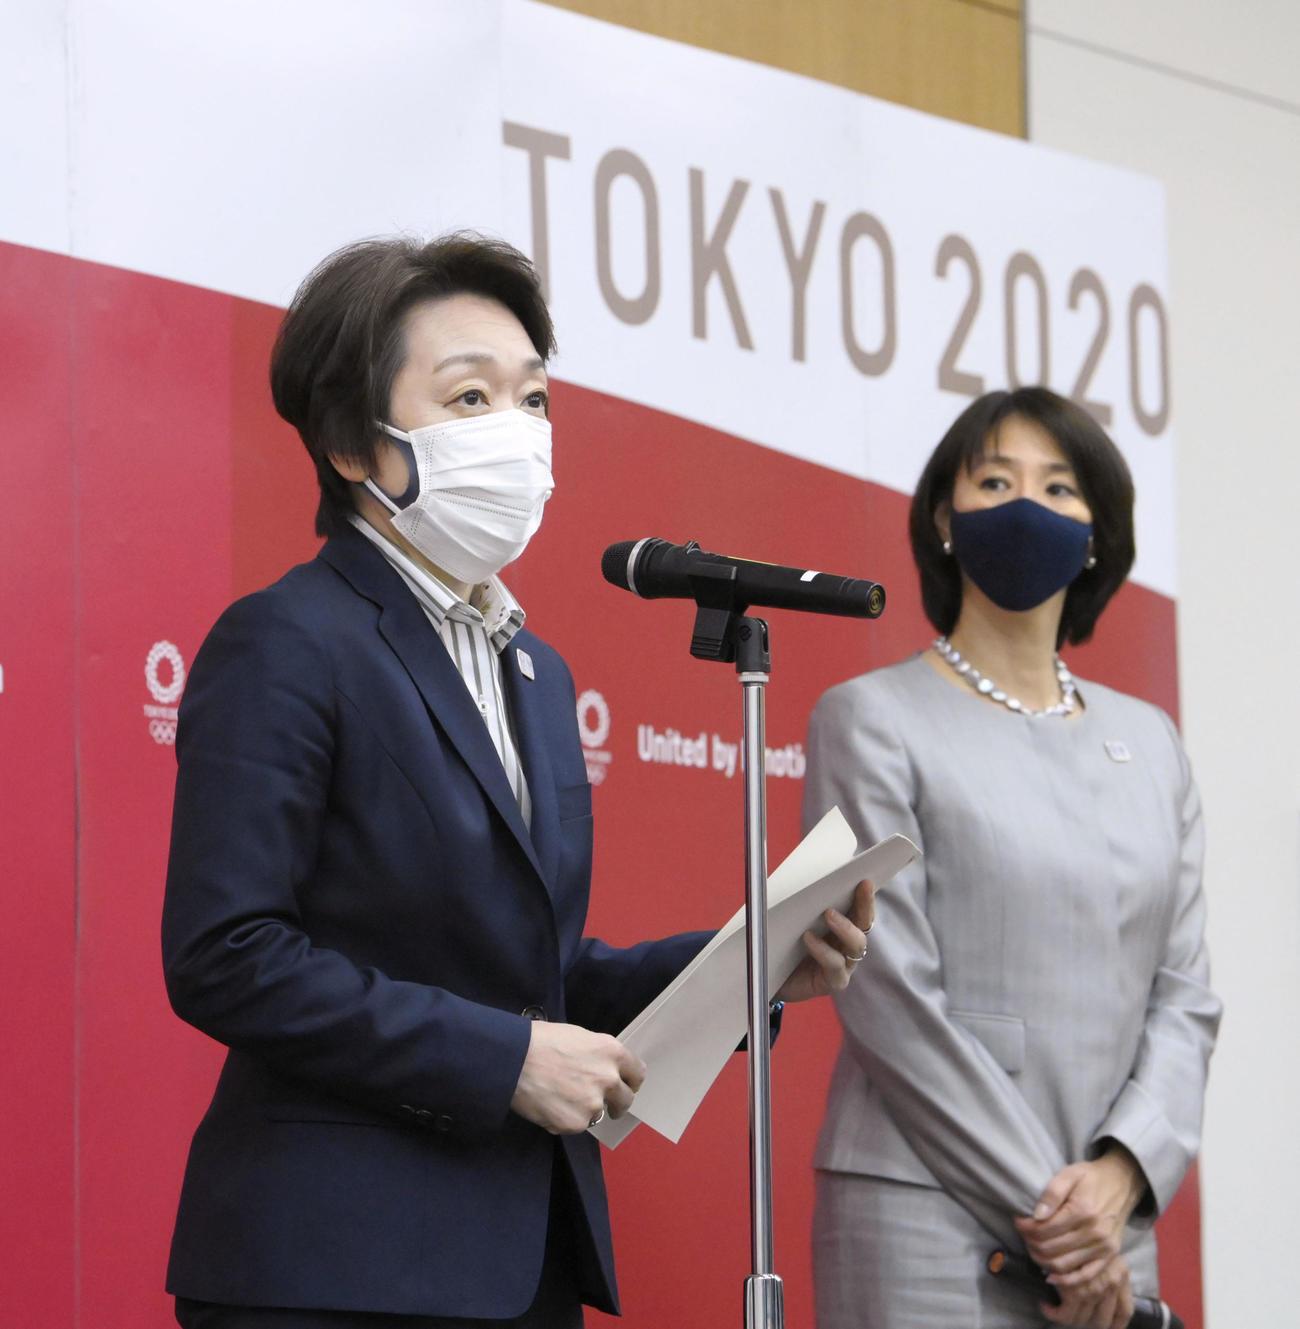 IOC理事会でのプレゼンテーションを終え、記者の質問に答える橋本聖子会長。右は小谷実可子スポーツディレクター(代表撮影)